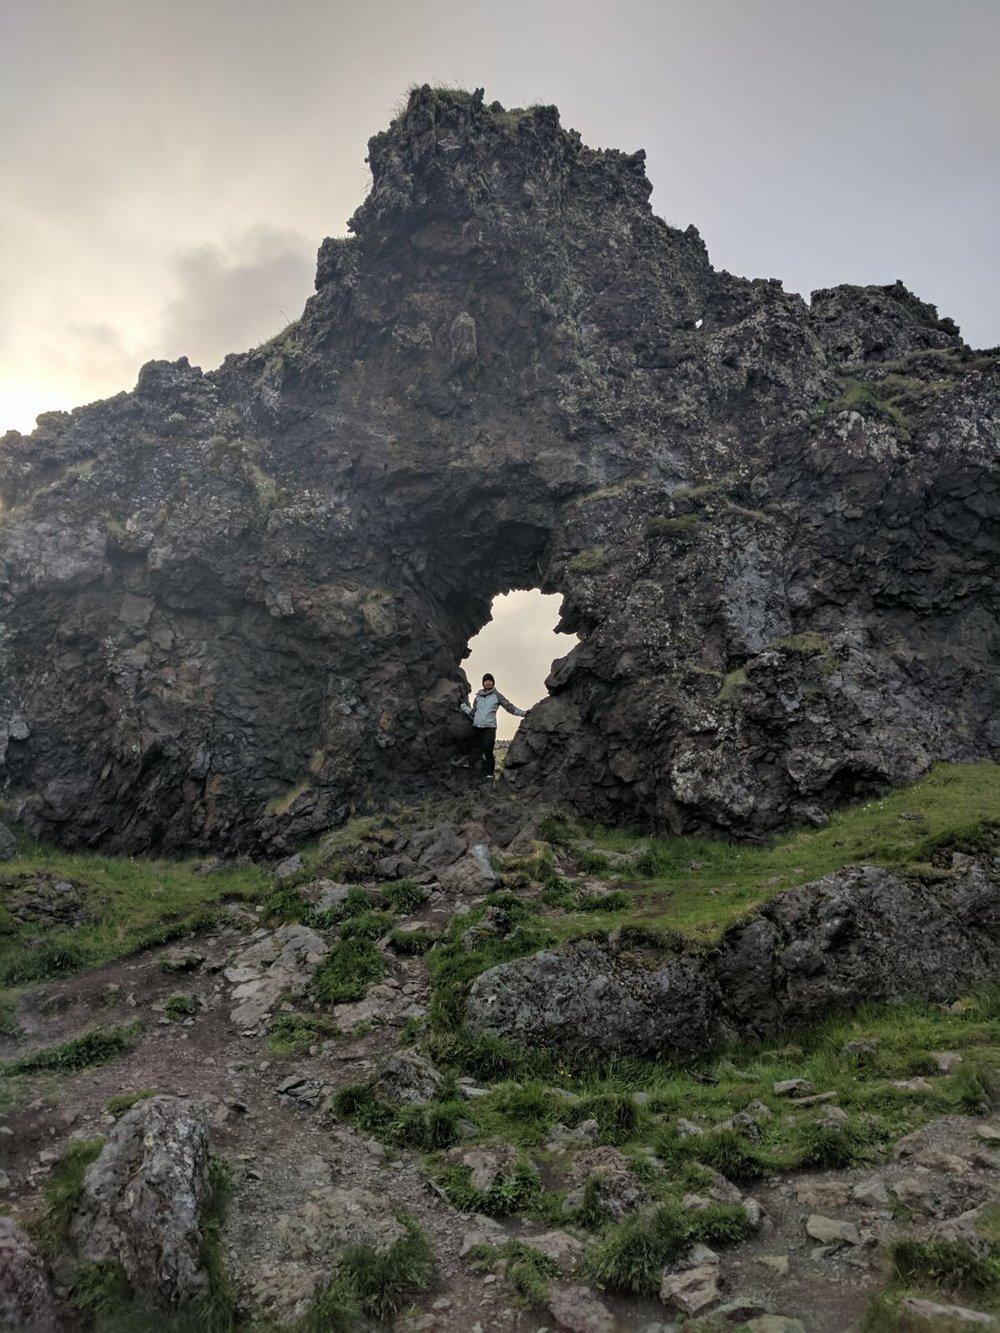 Exploring in volcanic ash in Dritvik.